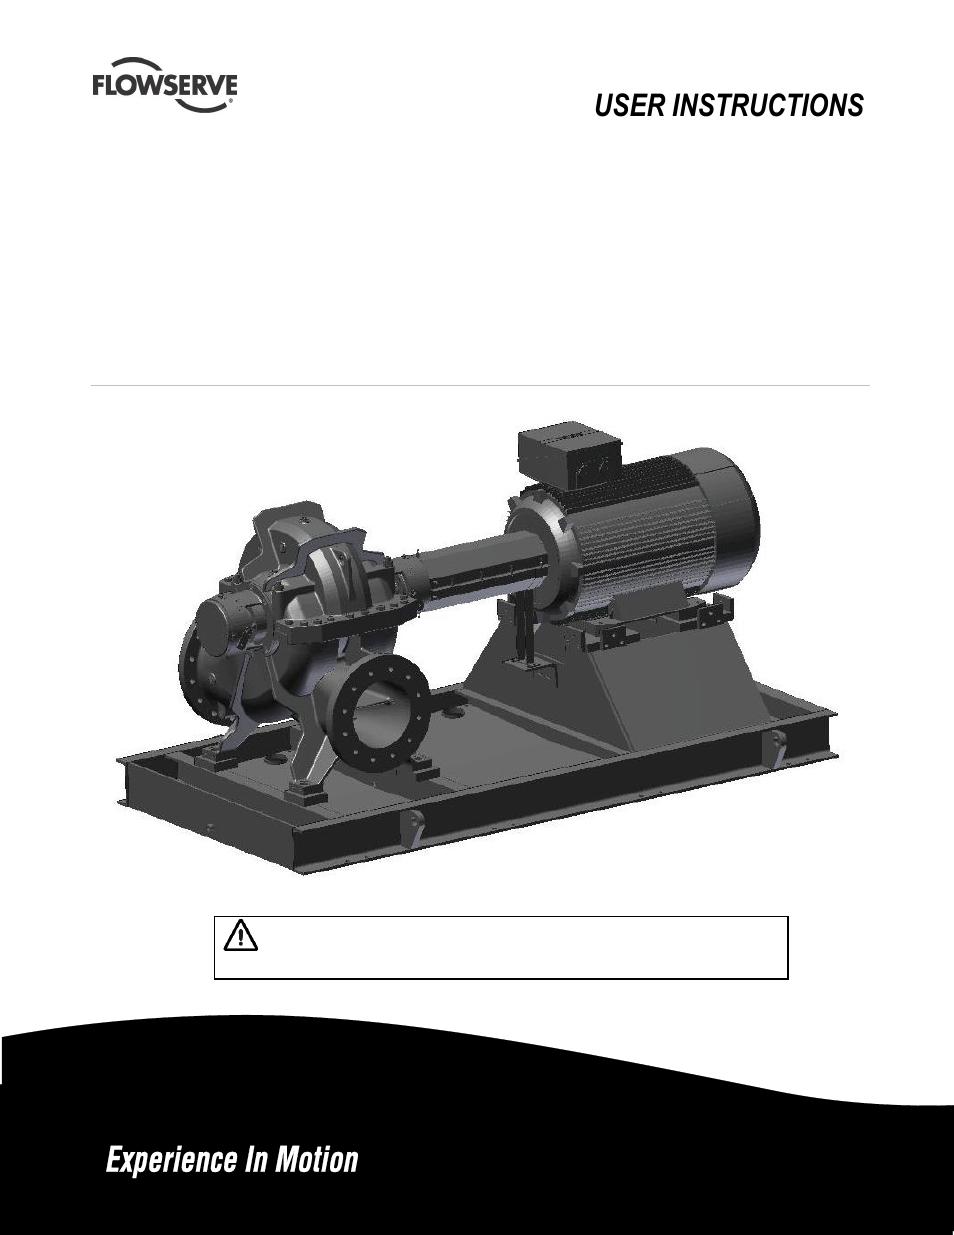 Flowserve centrifugal pump manual